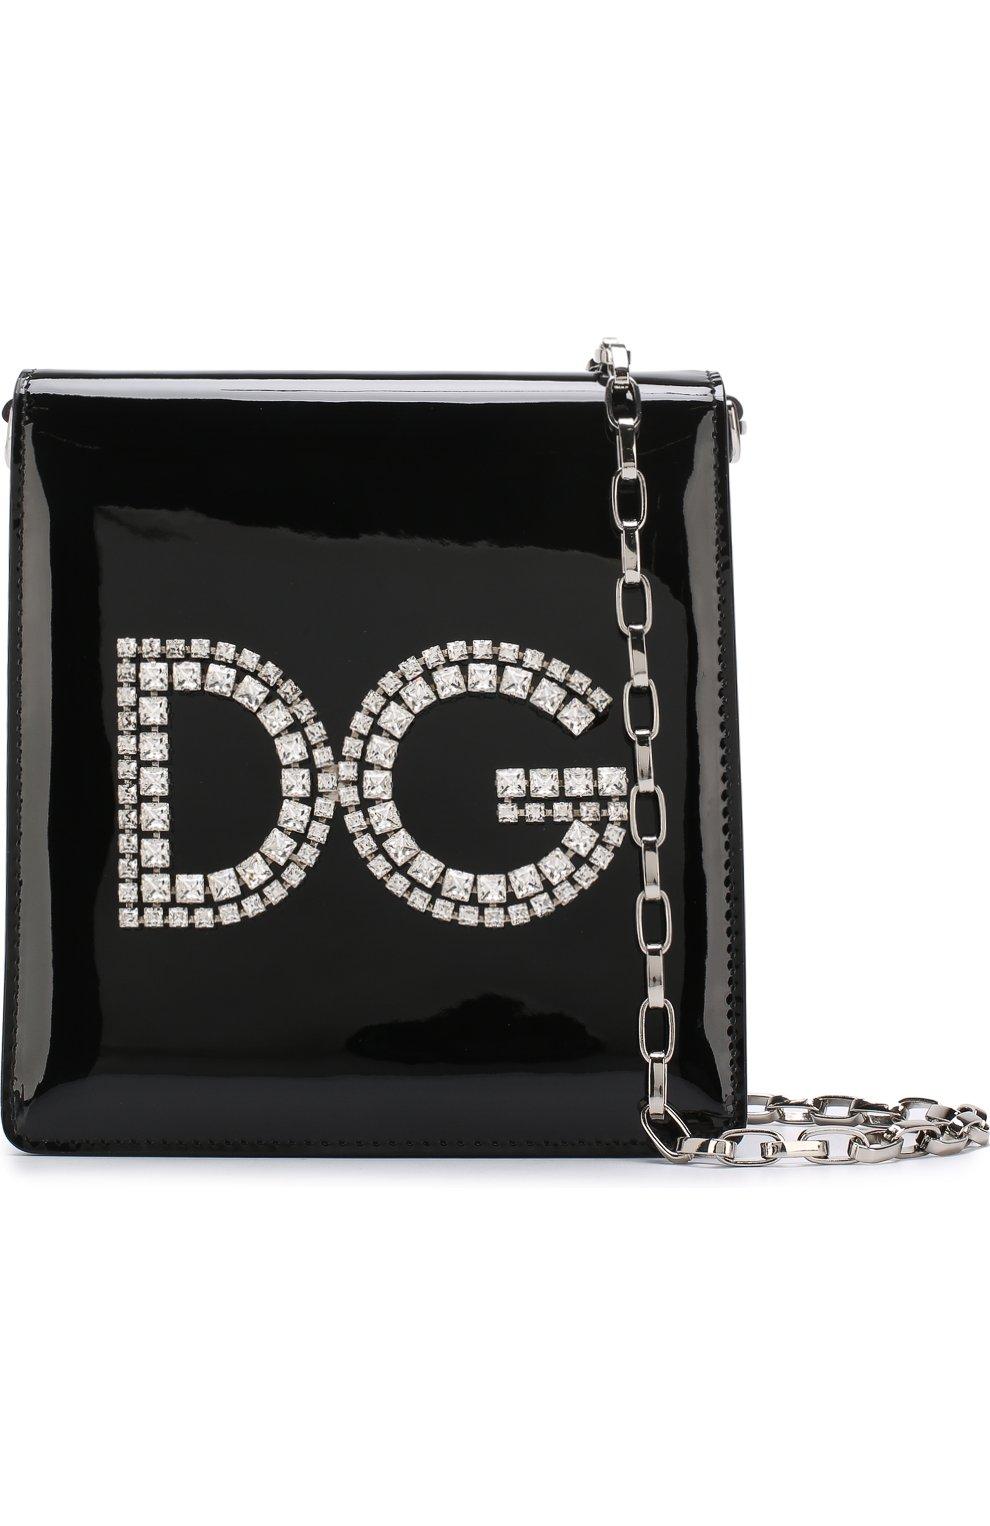 7c9b9ae5a0e5 Женская сумка dg girls DOLCE & GABBANA черная цвета — купить за ...